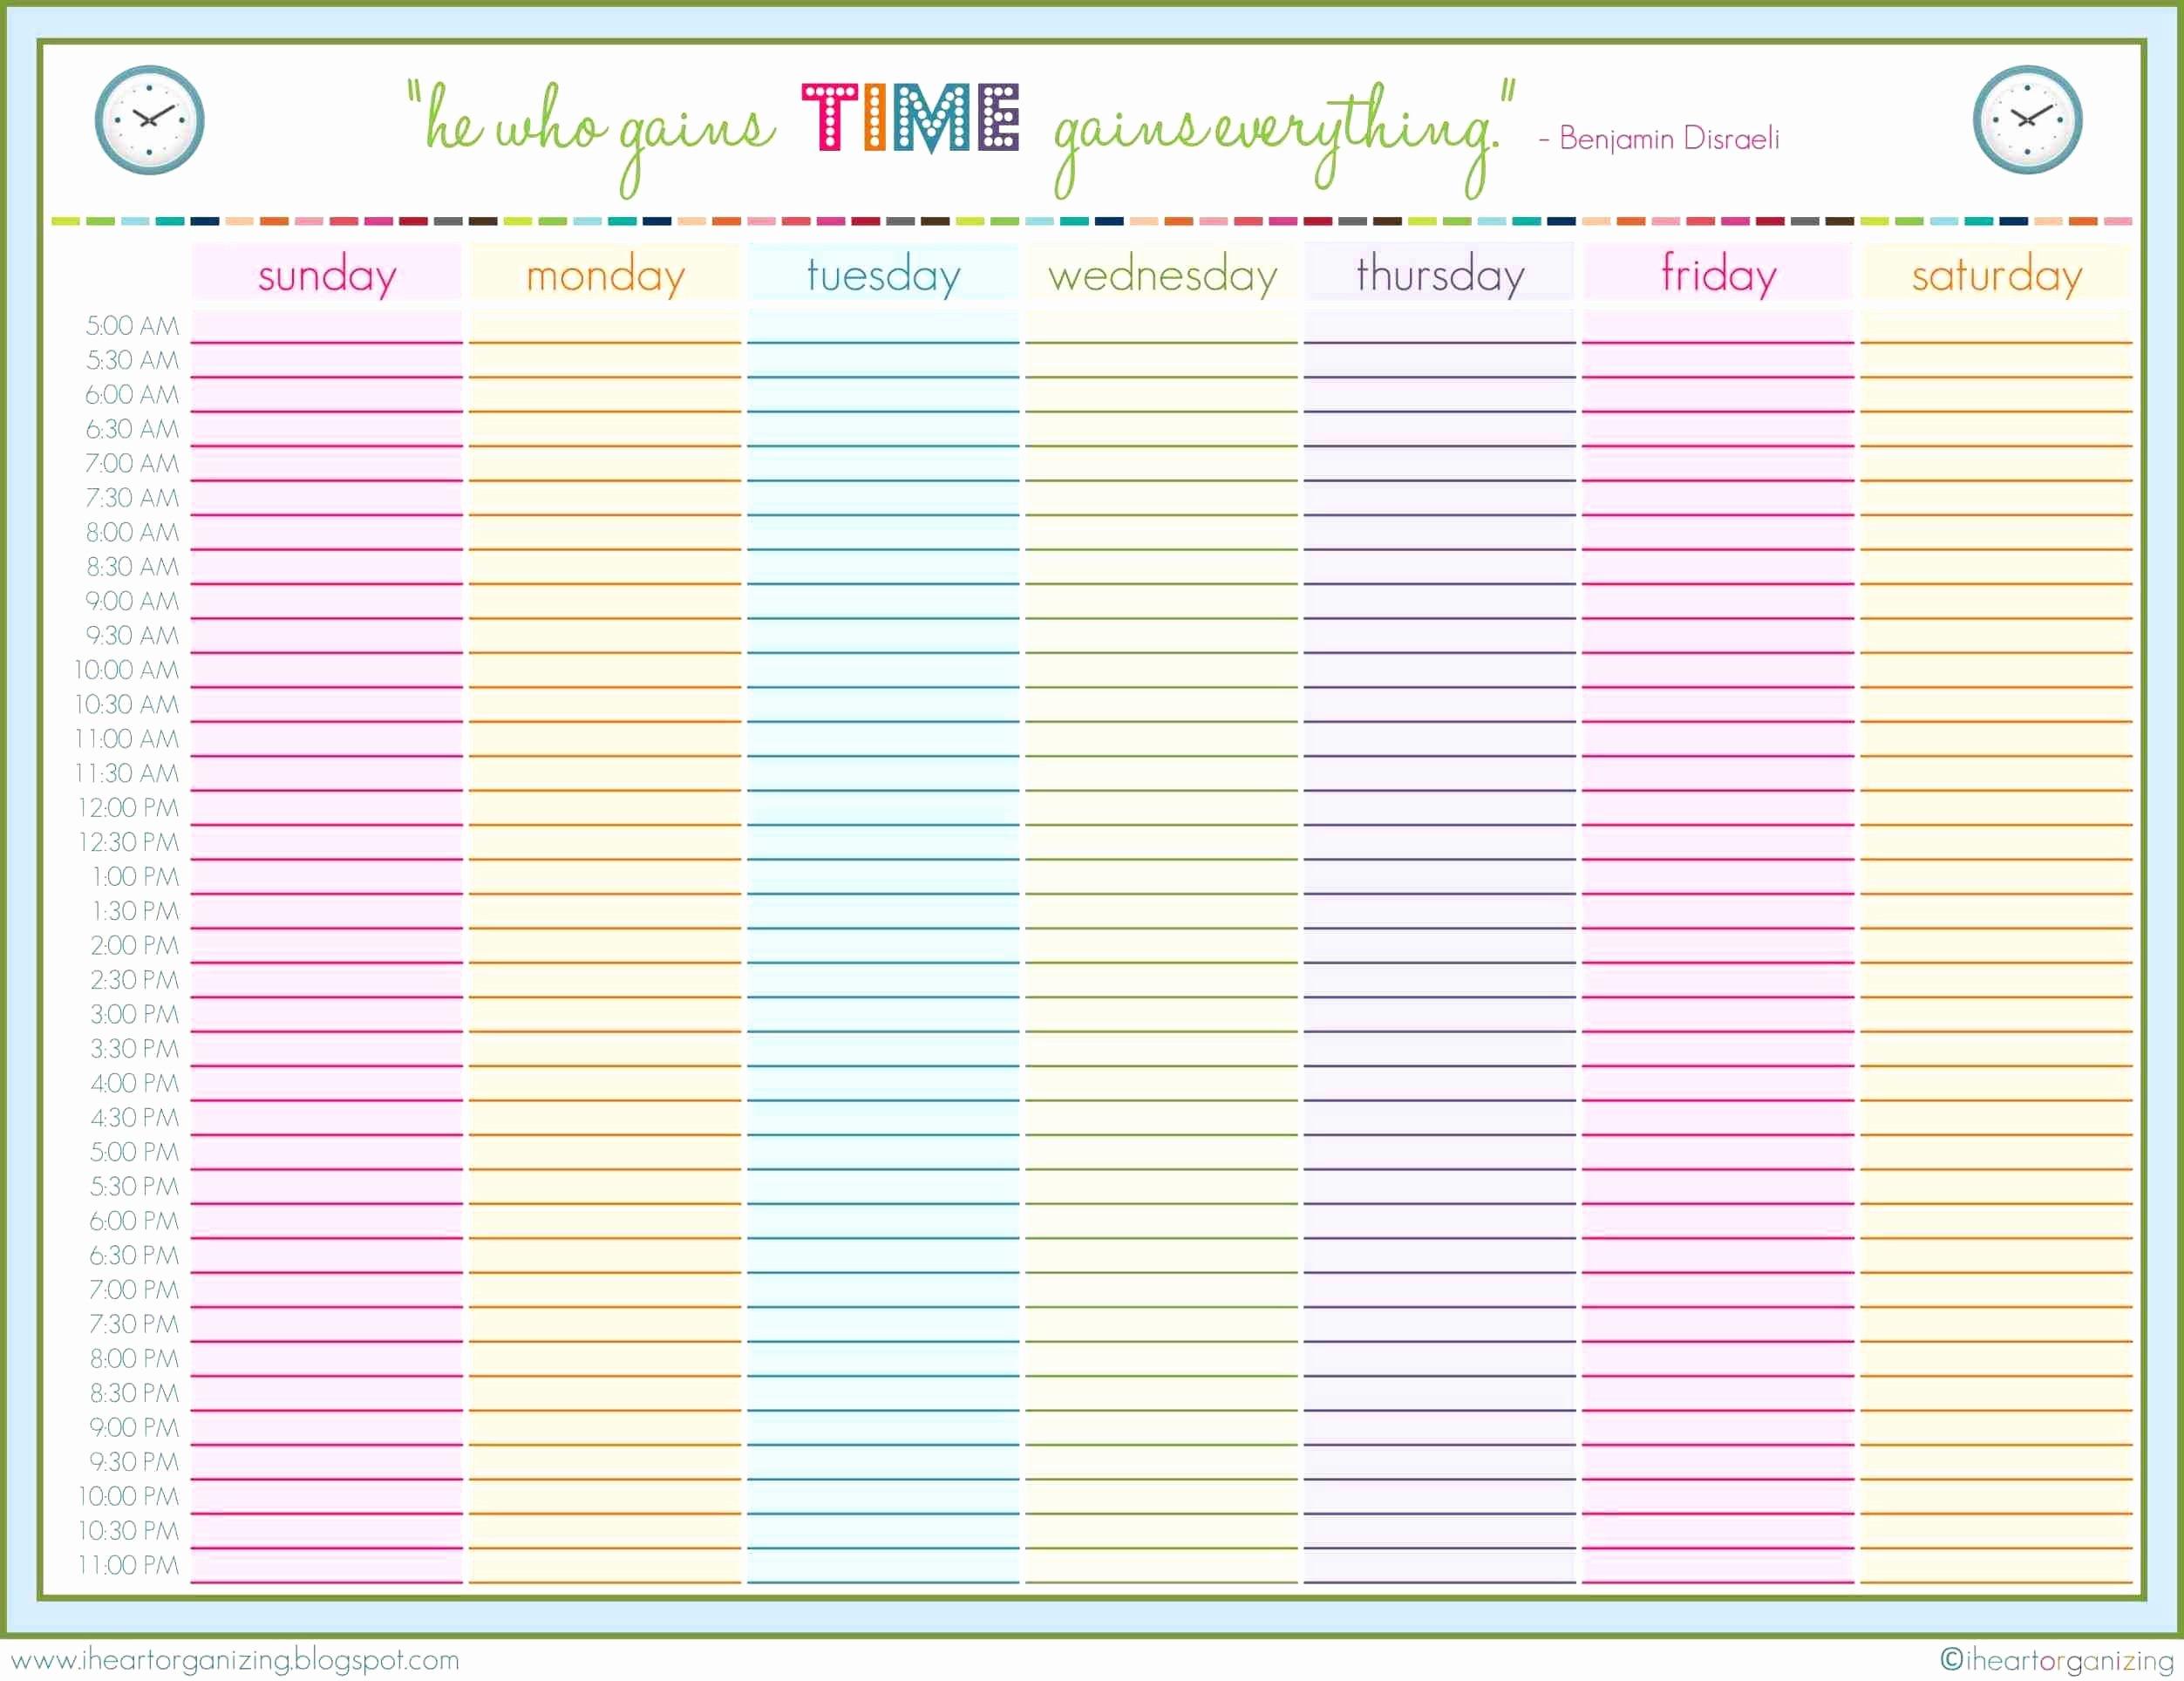 Cute Class Schedule Template Inspirational New Cute Weekly Schedule Template Inspirational Weekly